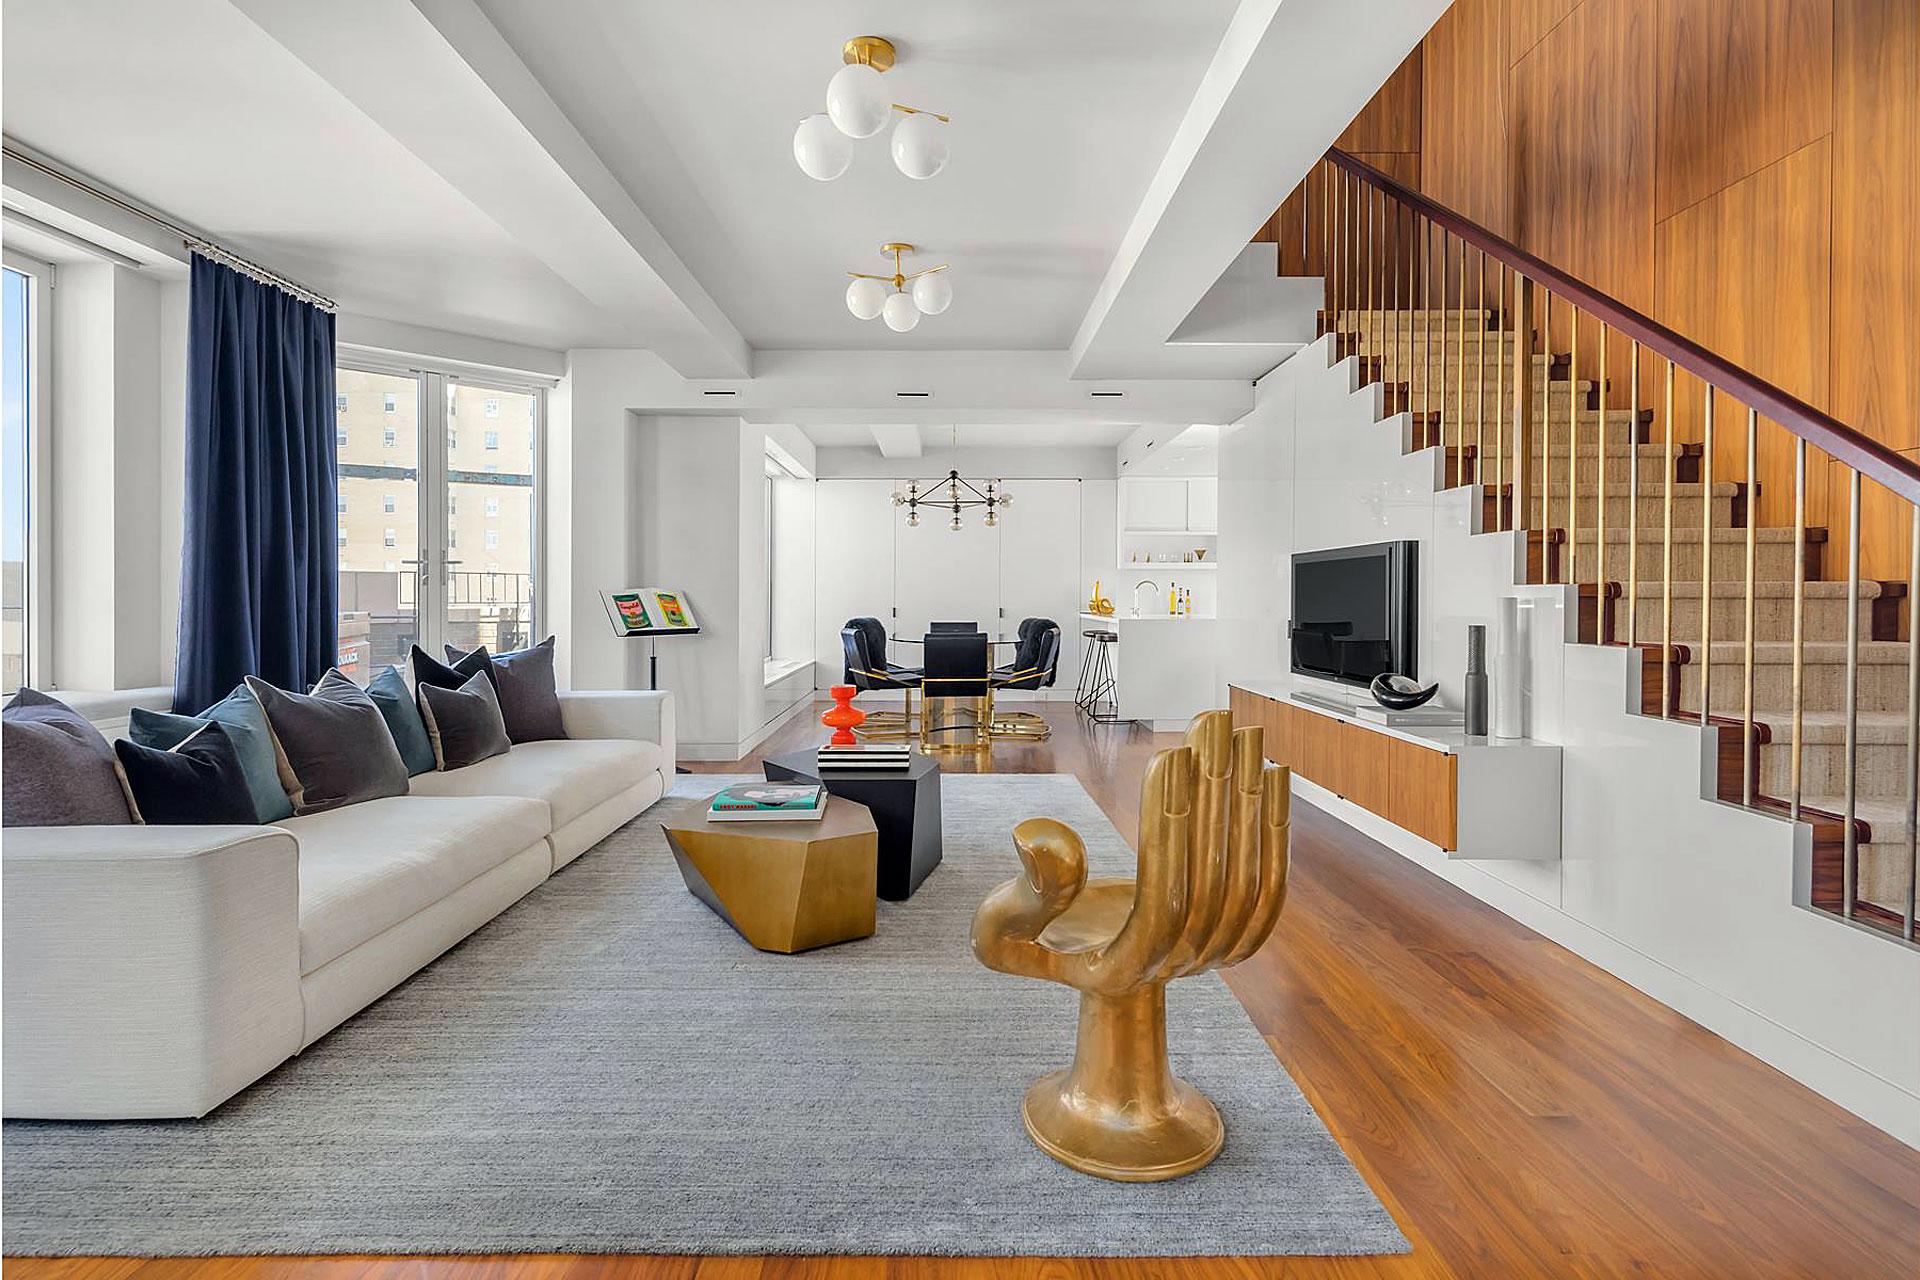 Keith Richard's Greenwich Village Penthouse